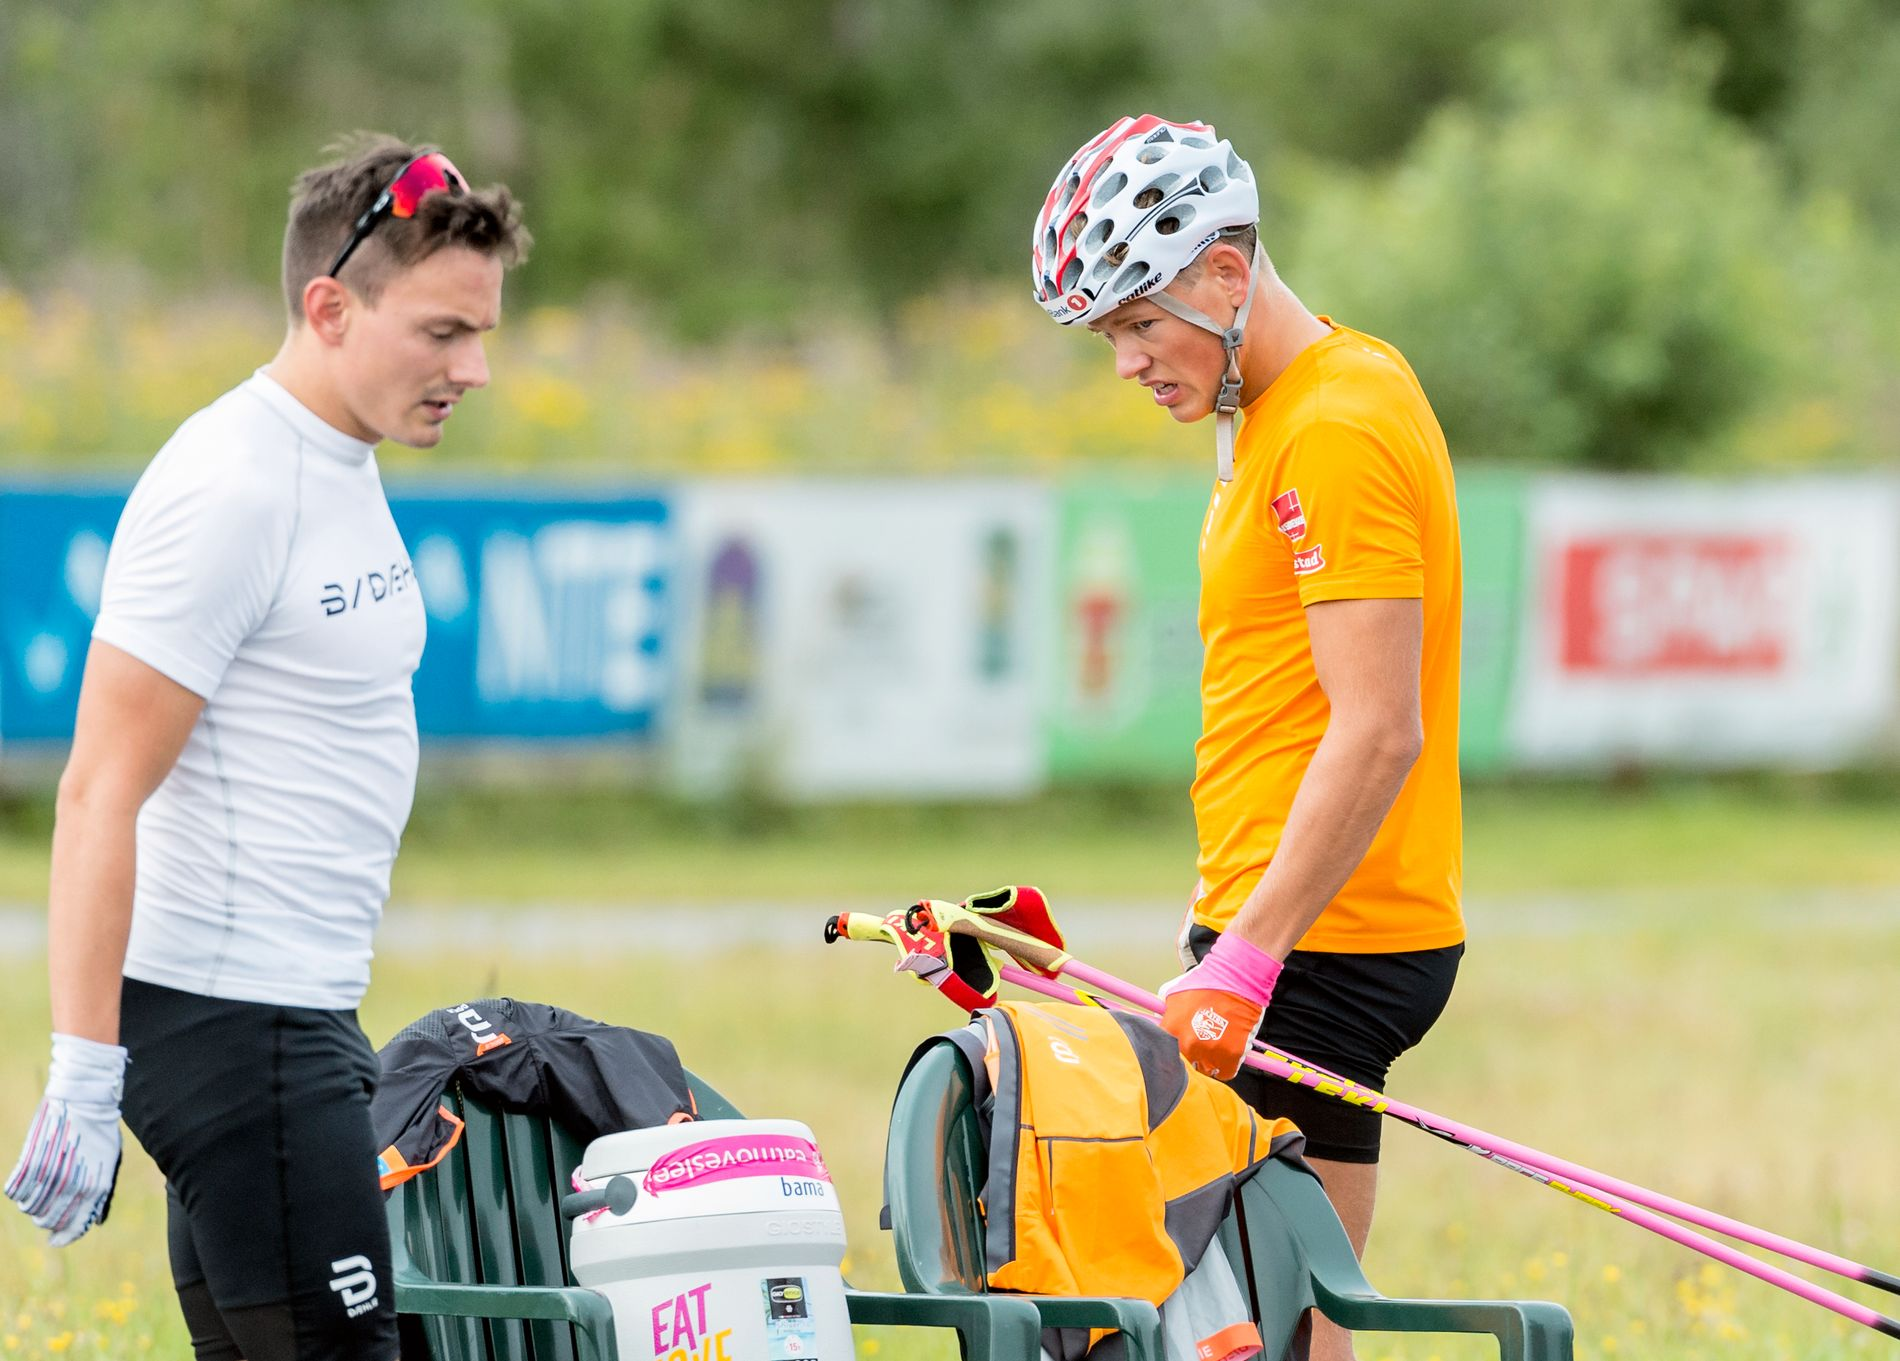 TUNGE TAK: Finn-Hågen Krogh (t.v.) ga seg etter prologen på sprintøkten under samling tirsdag, mens Johannes Høsflot Klæbo hadde fått nok foran det siste draget.